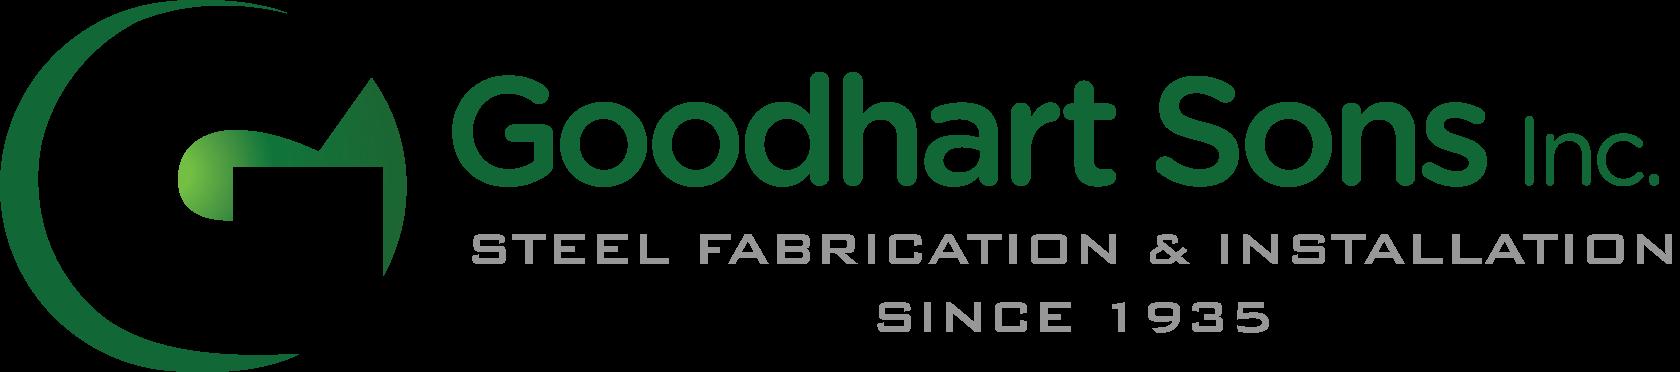 Goodhart Sons Inc. logo